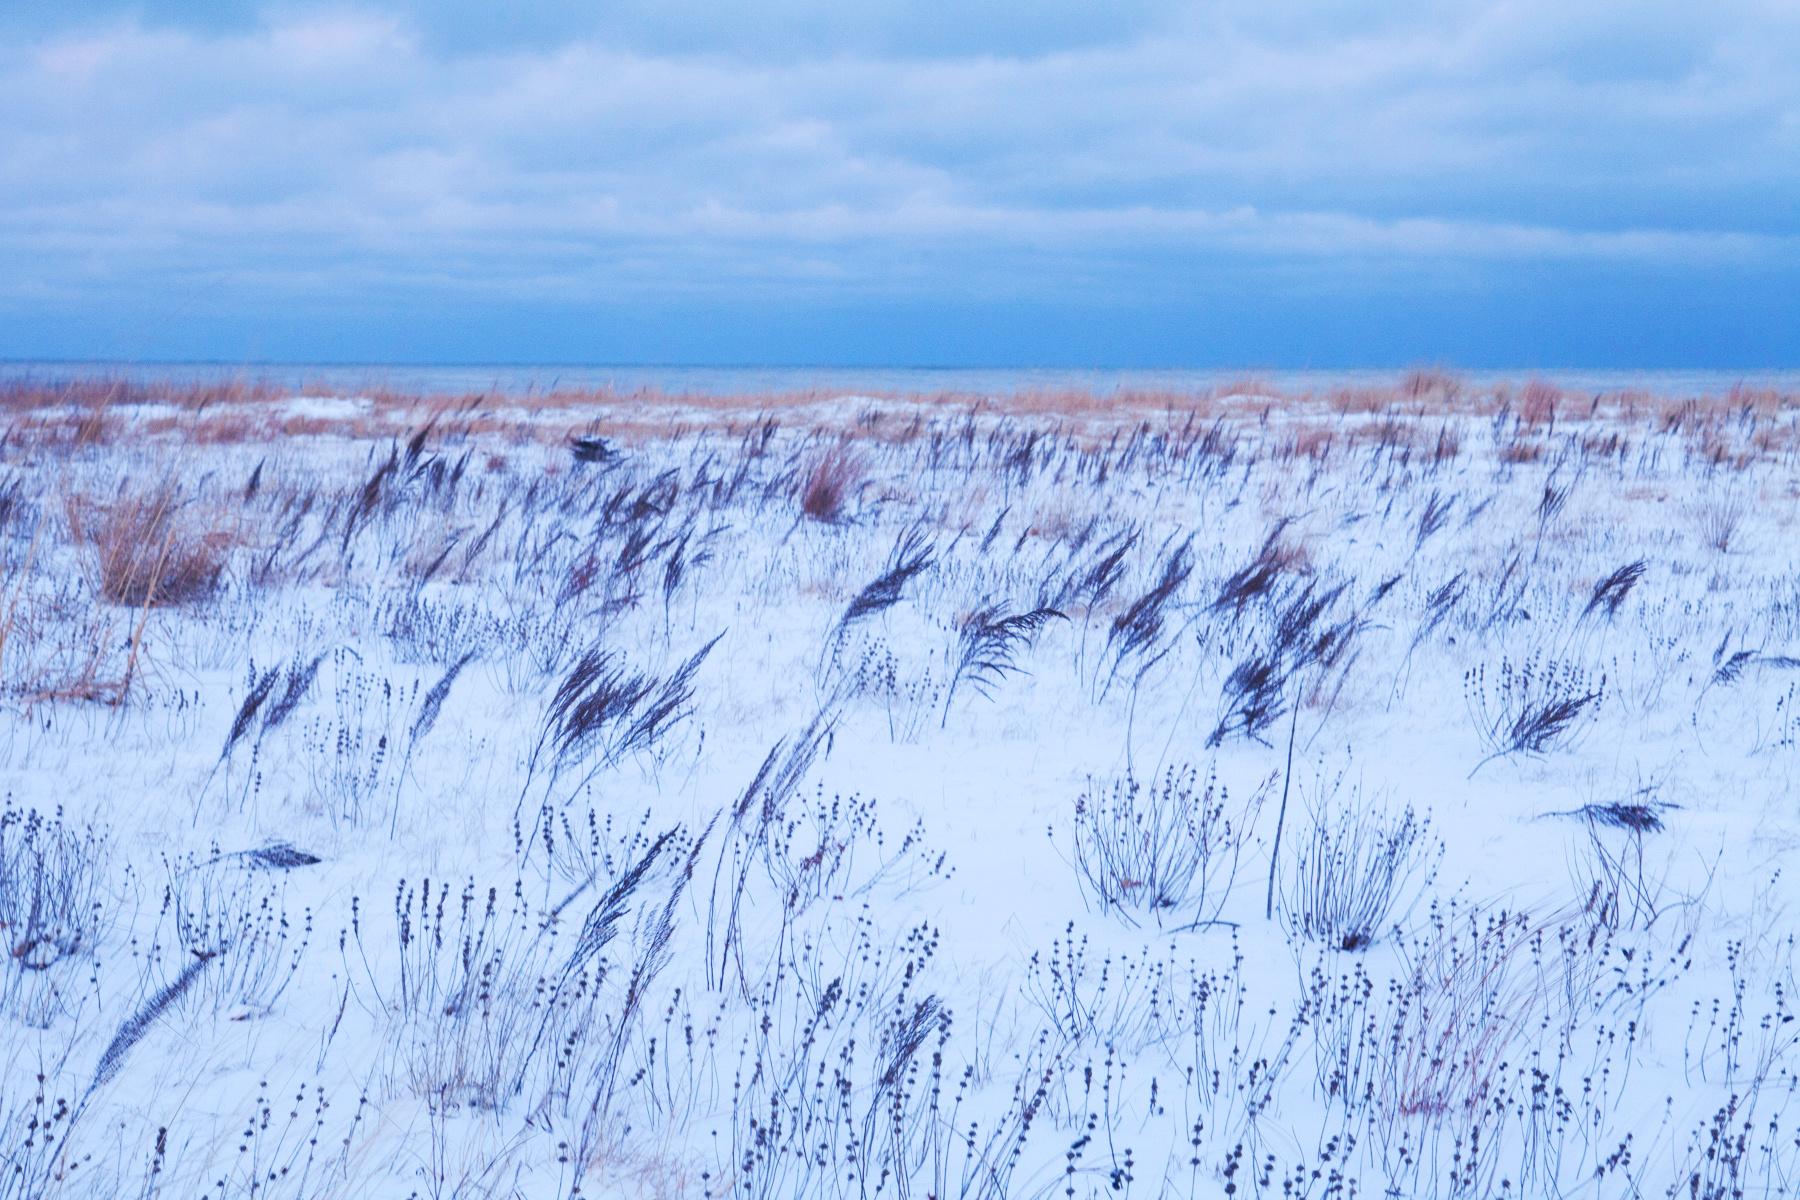 Winter Landscape, Chicago